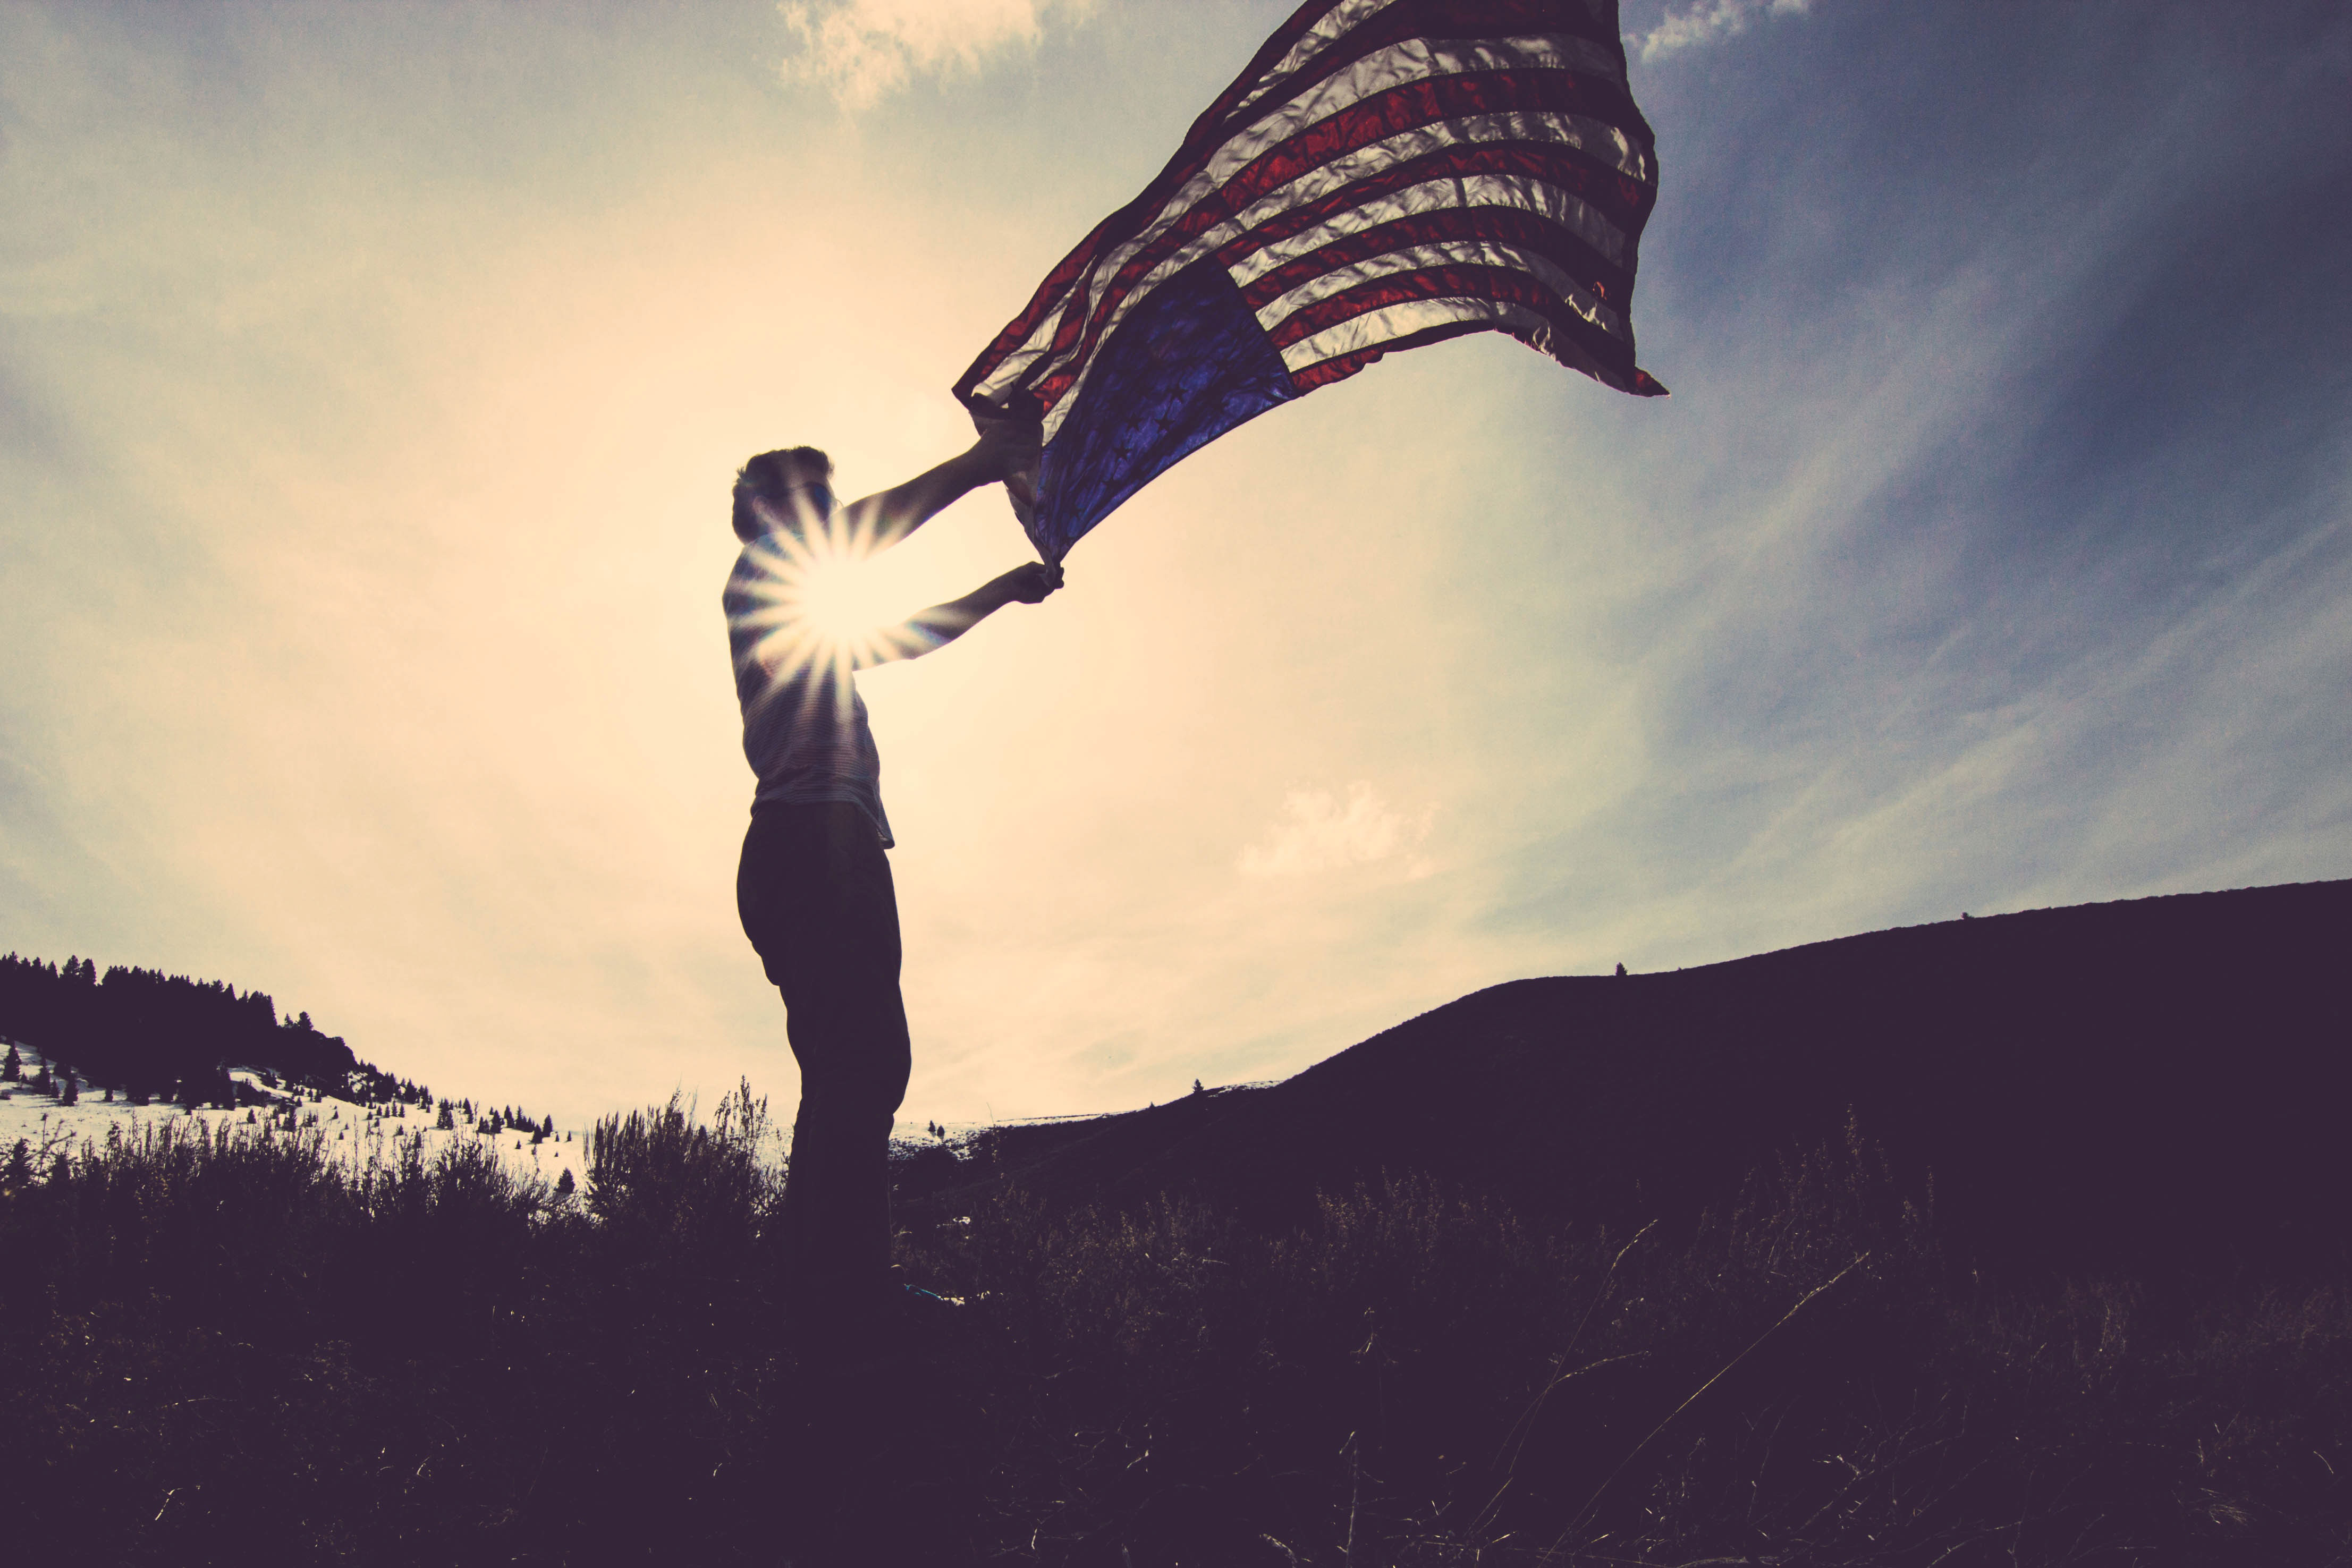 A person waving an American flag in the air